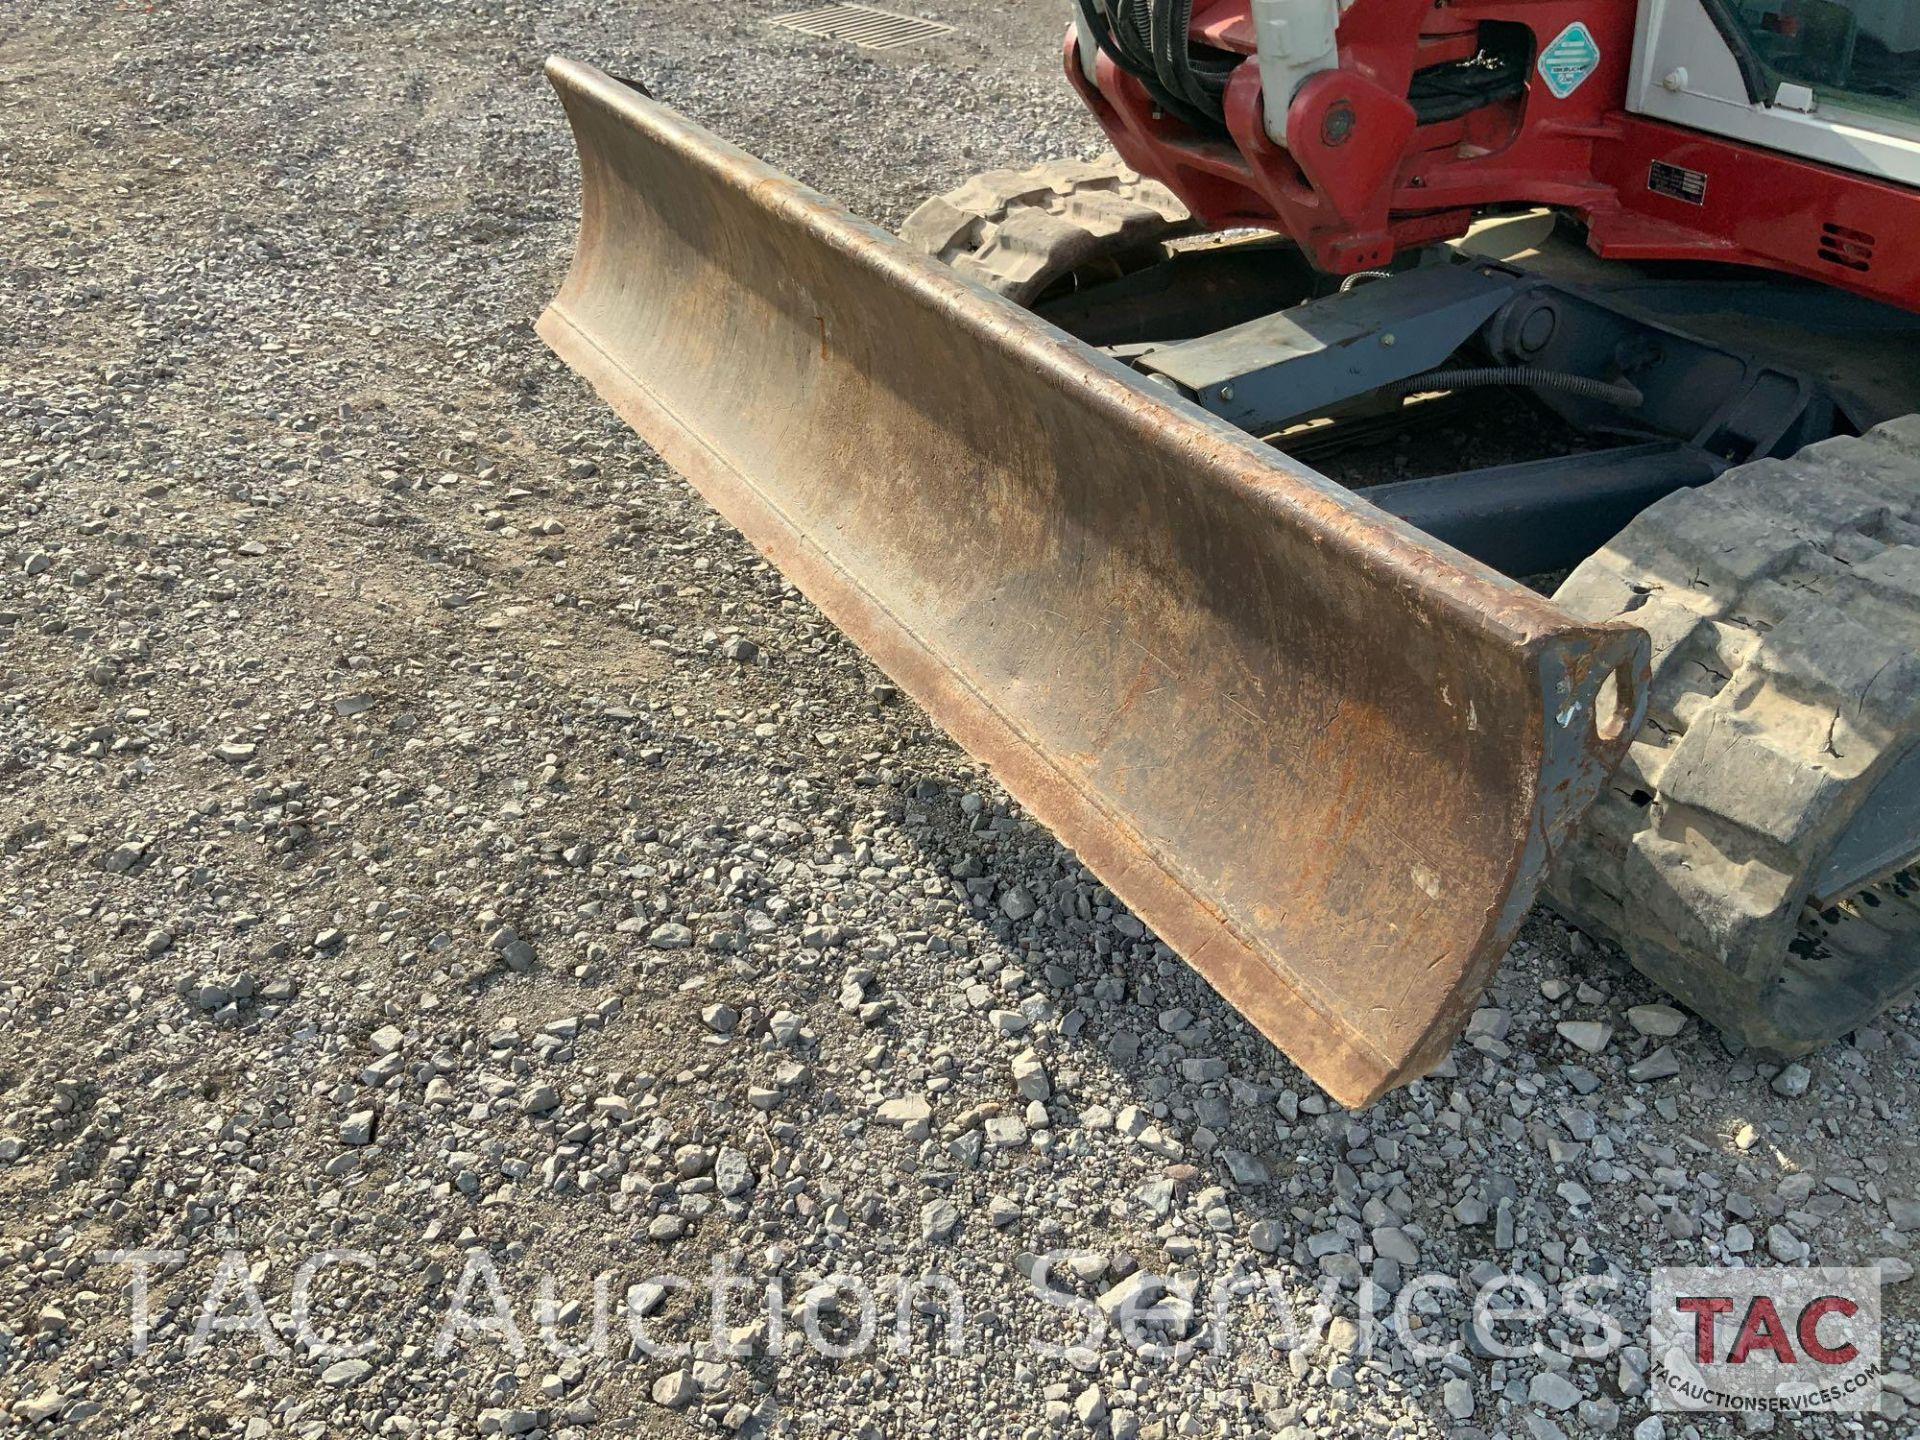 2017 Takeuchi TB290 Excavator - Image 38 of 45